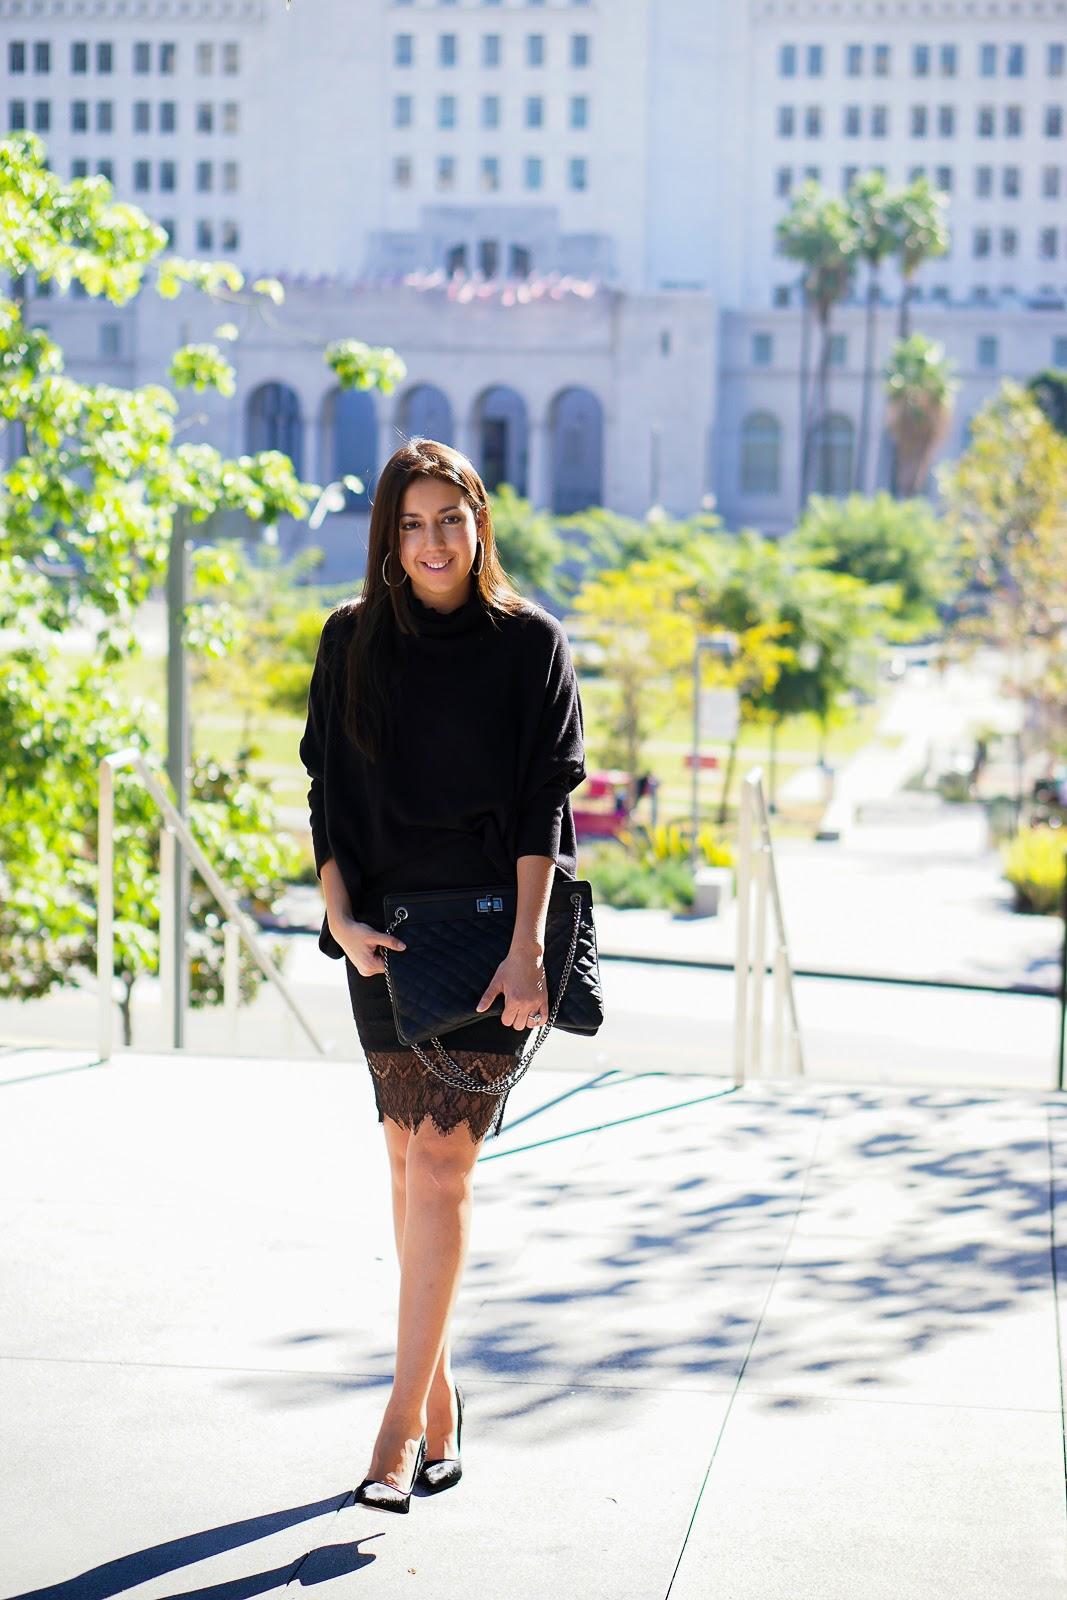 Kardashian Kollection black lace skirt, Black Lace Skirt, Black Pumps, Black Heels, Forever 21 Black Clutch, Oversized Sweater, Pencil Skirt, Lace Skirt, How to wear a Lace Skirt, Kardashian Kollection